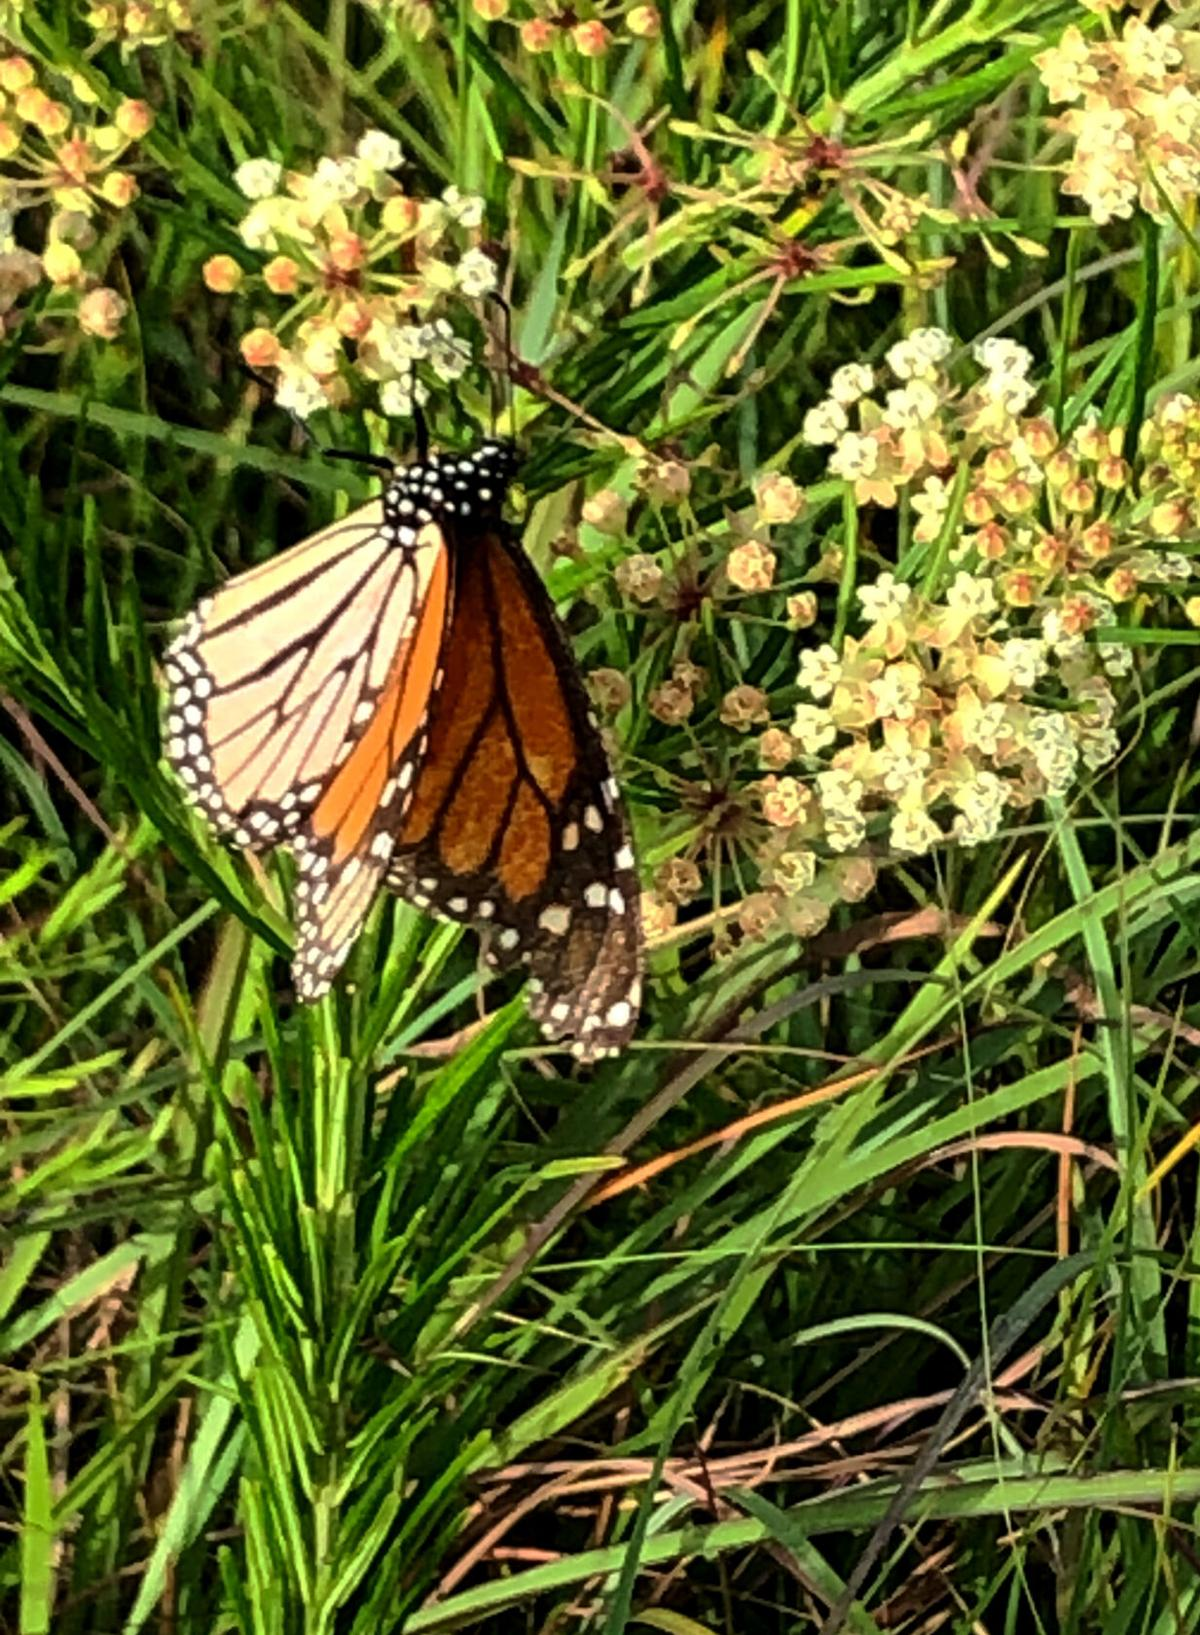 072121 Prairie picture 1